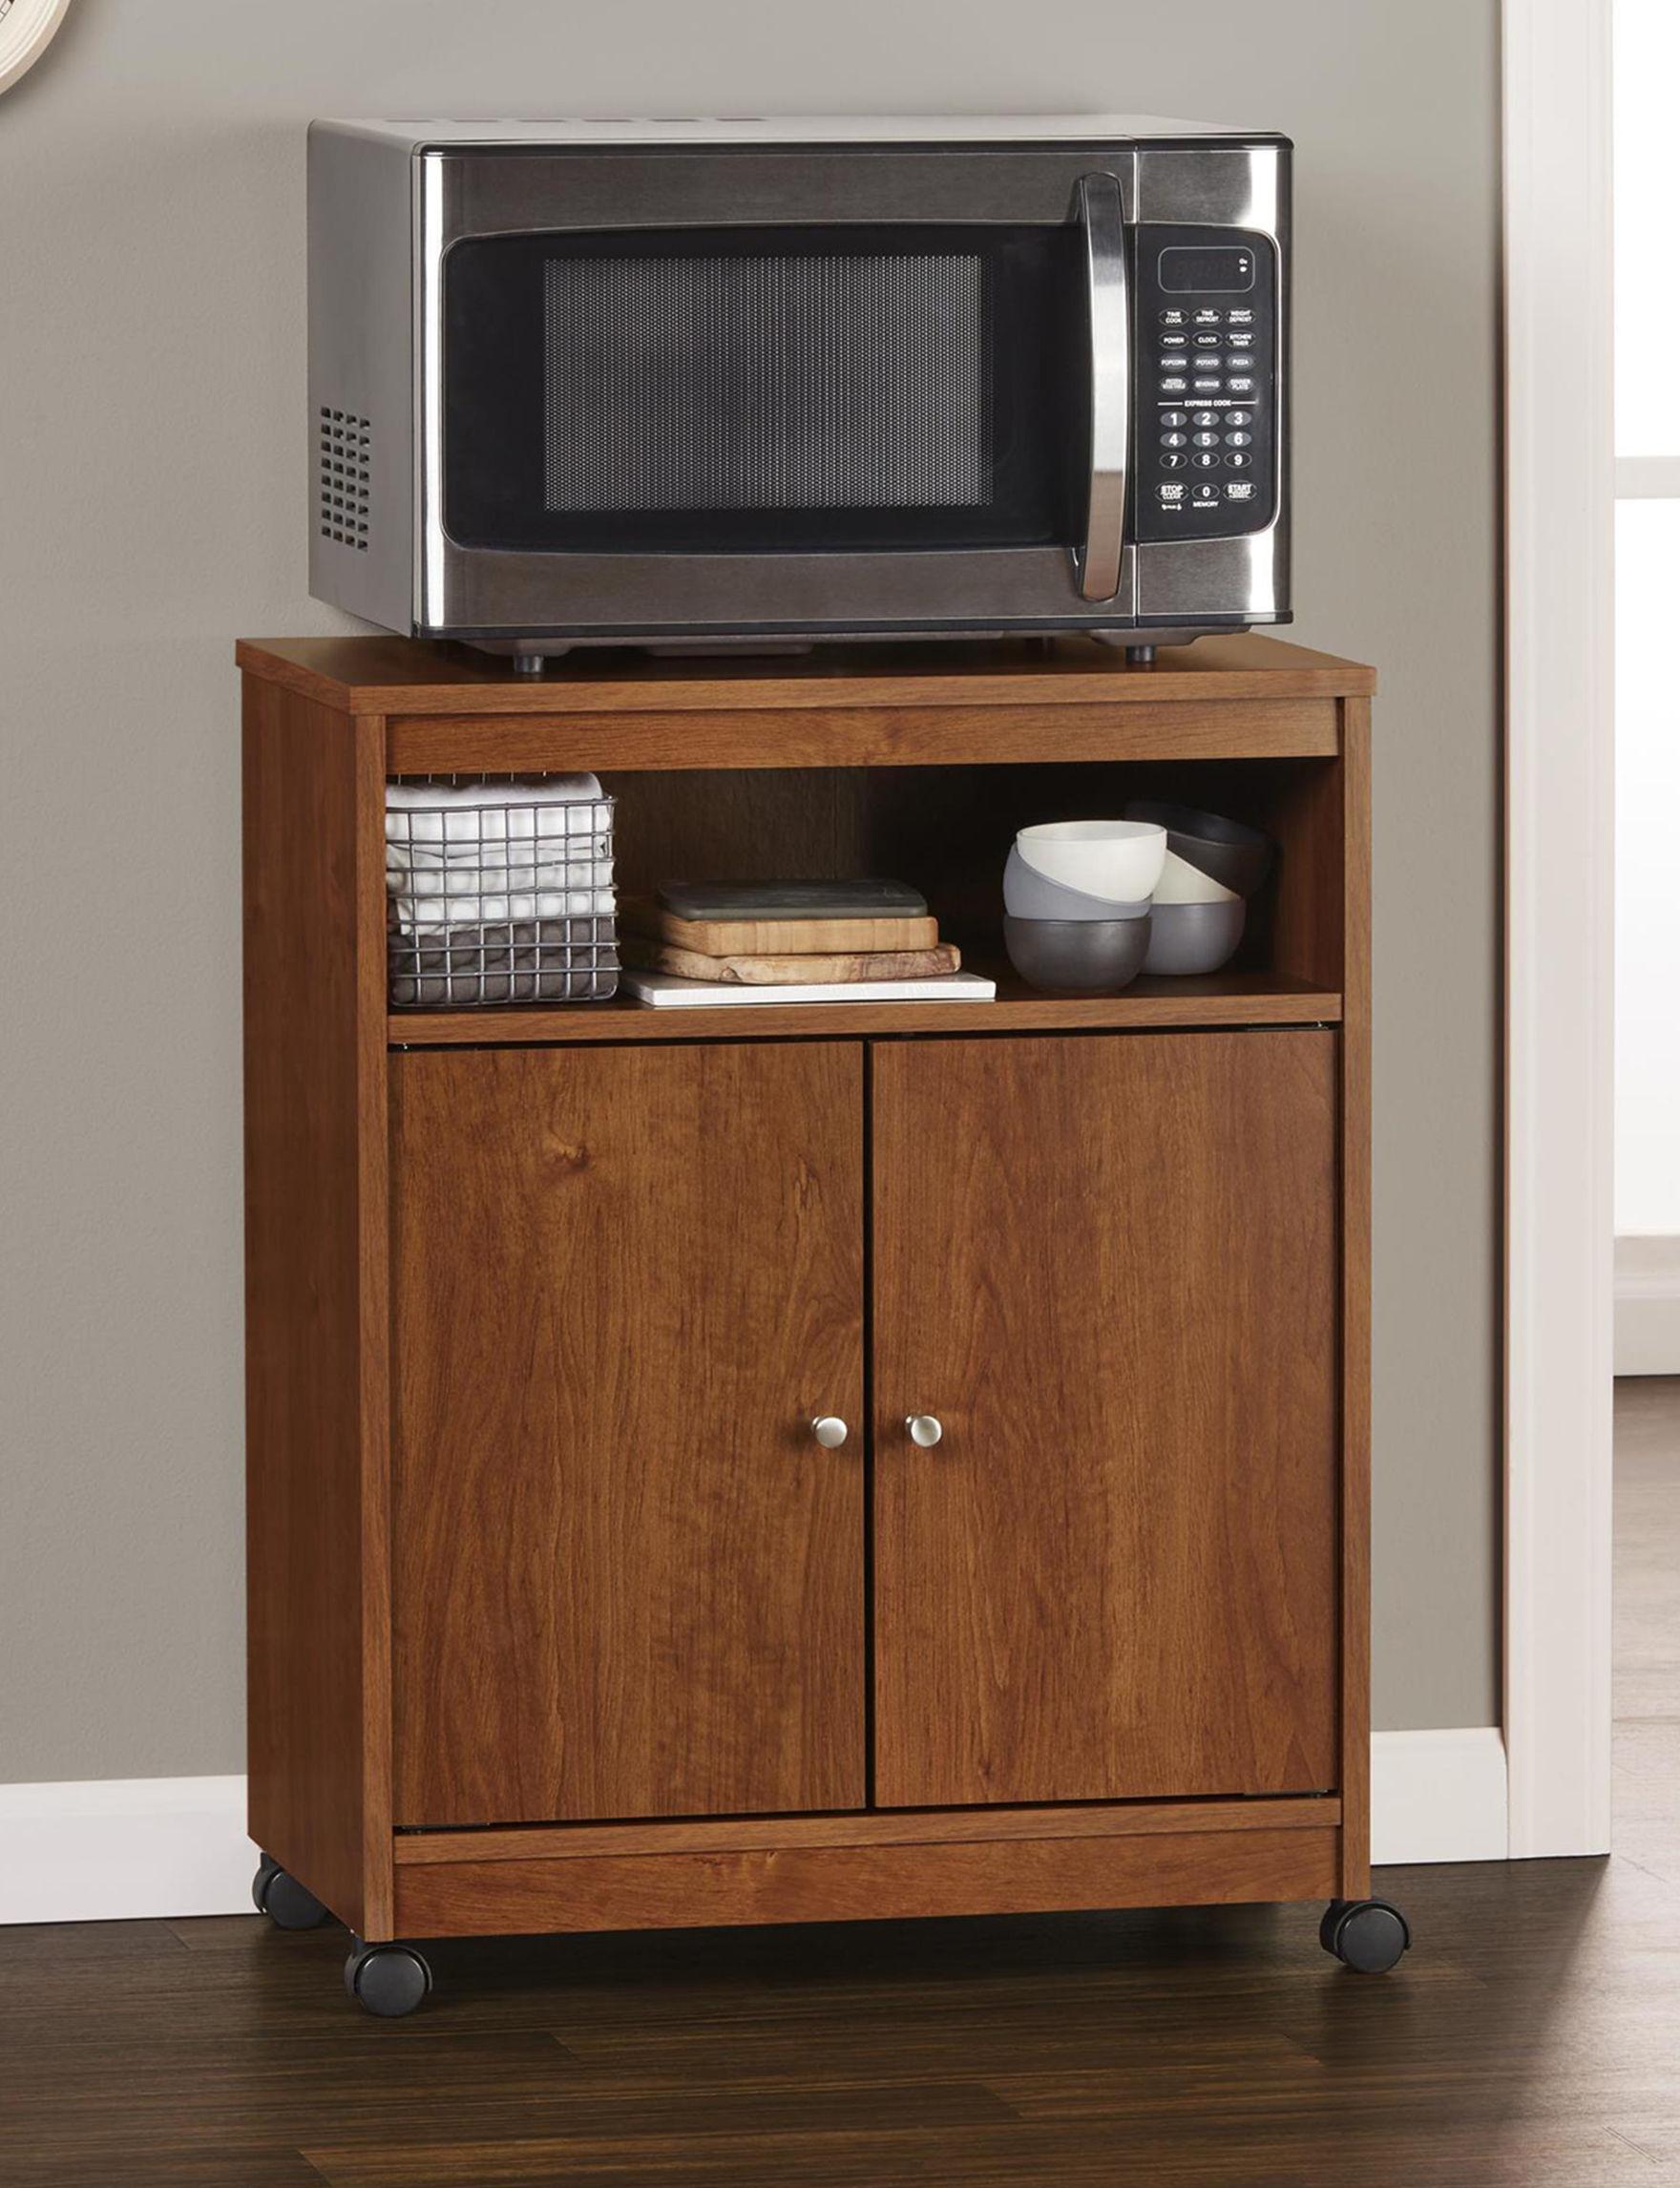 Ameriwood Brown Kitchen Islands & Carts Kitchen & Dining Furniture